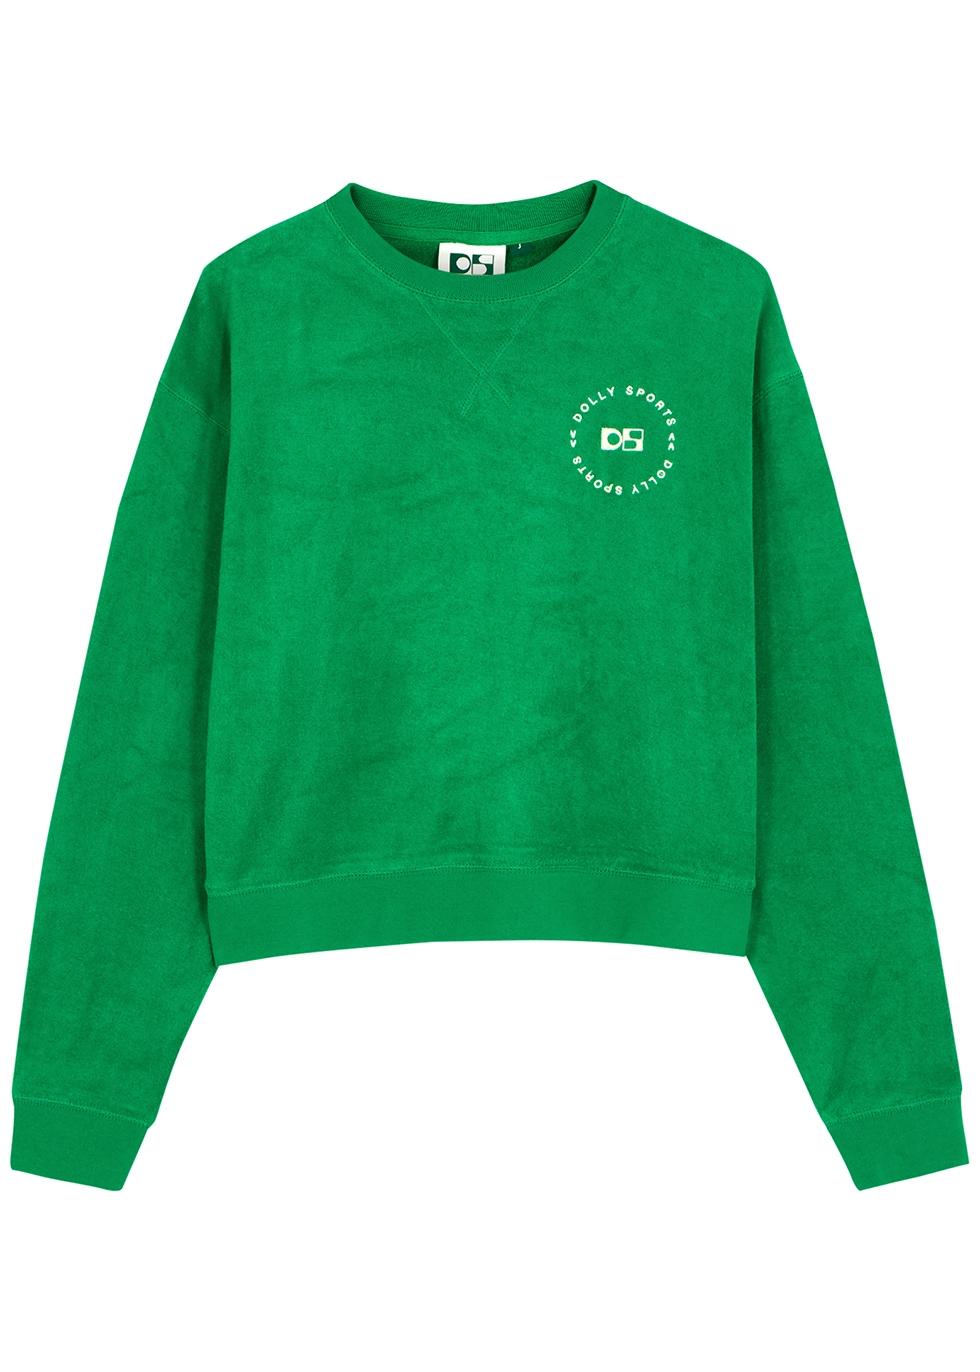 Classic green logo terry-cotton sweatshirt